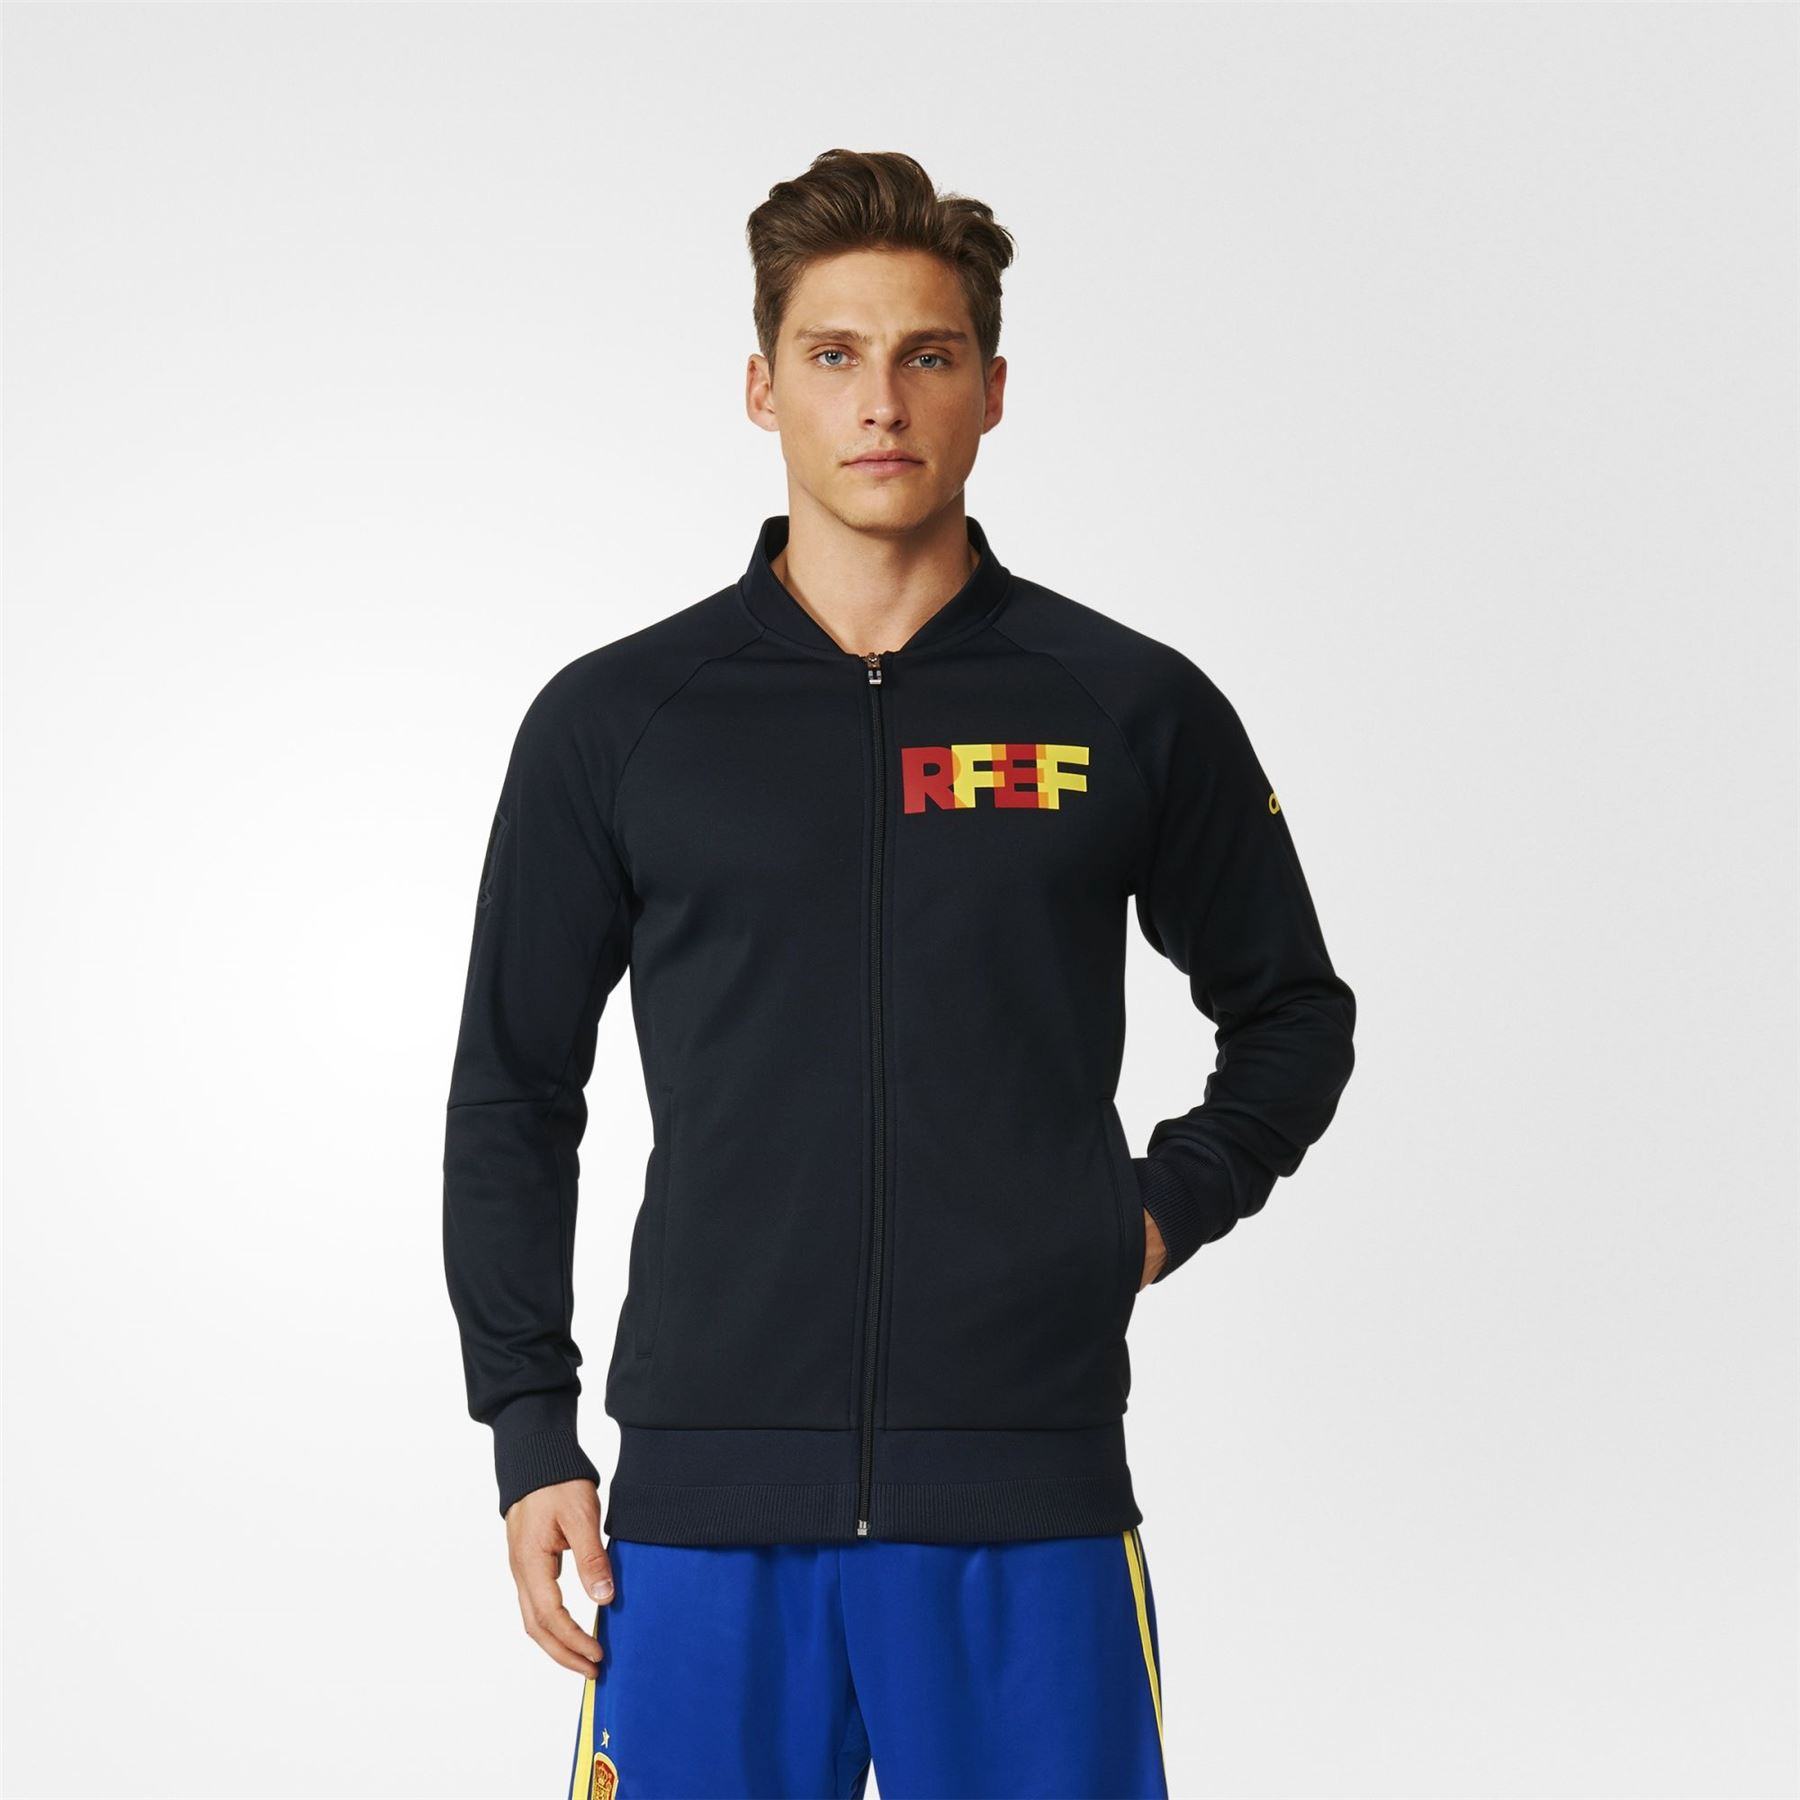 Details about adidas SPAIN NATIONAL TEAM KNIT ANTHEM JACKET BLACK ESPANA RFEF MEN'S